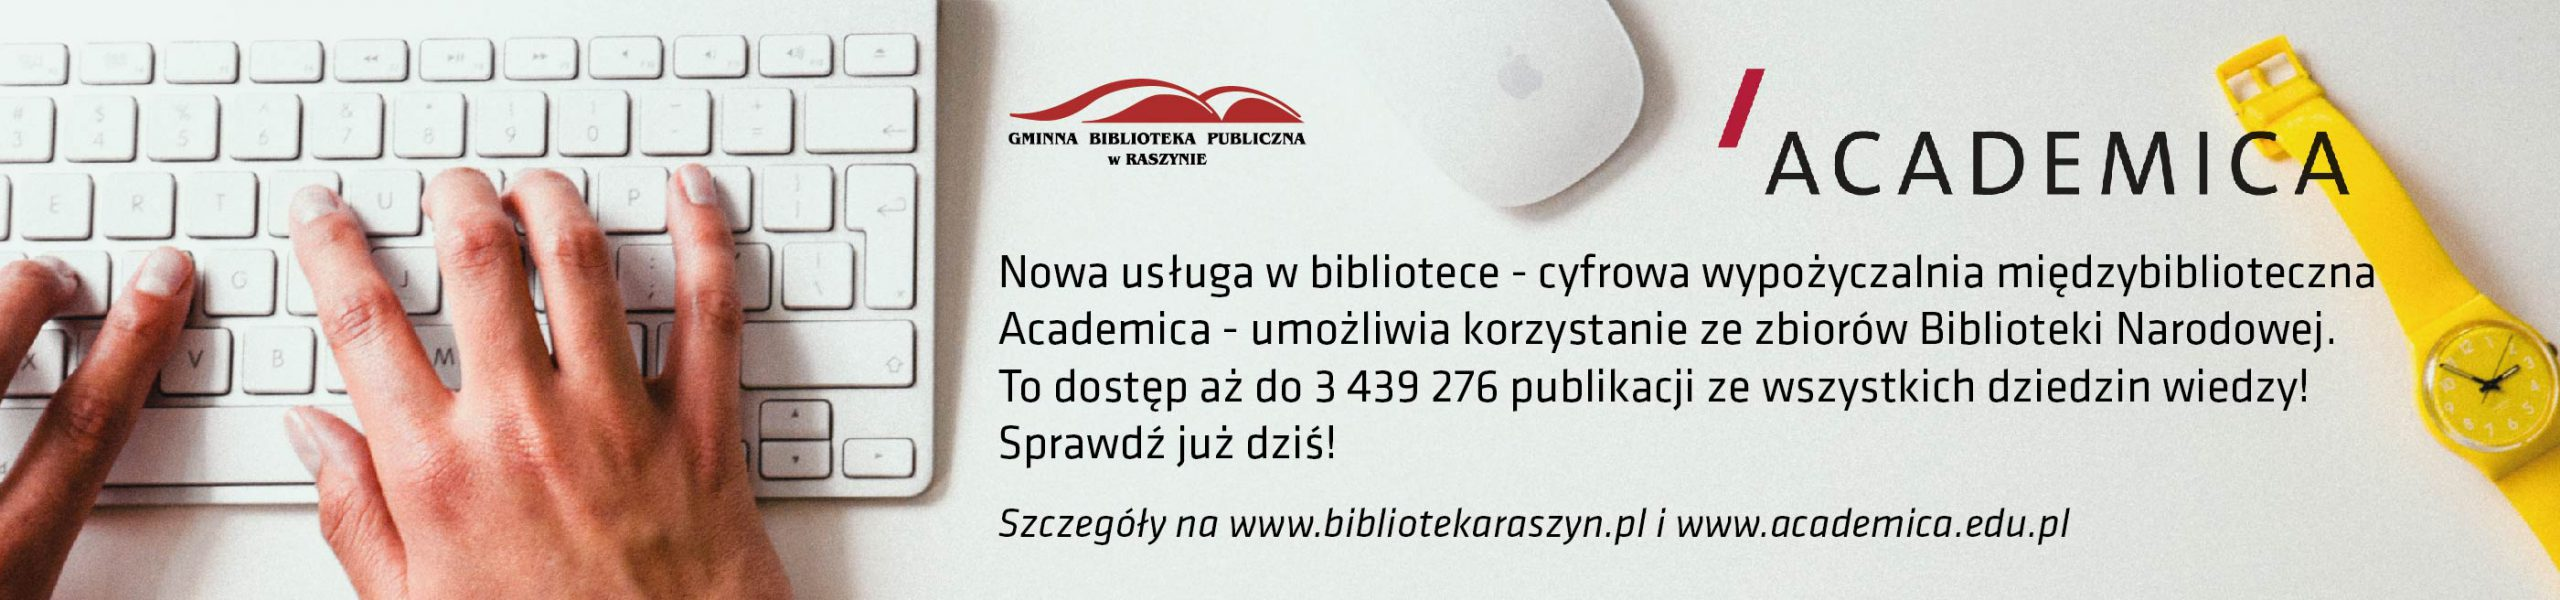 Academica baner